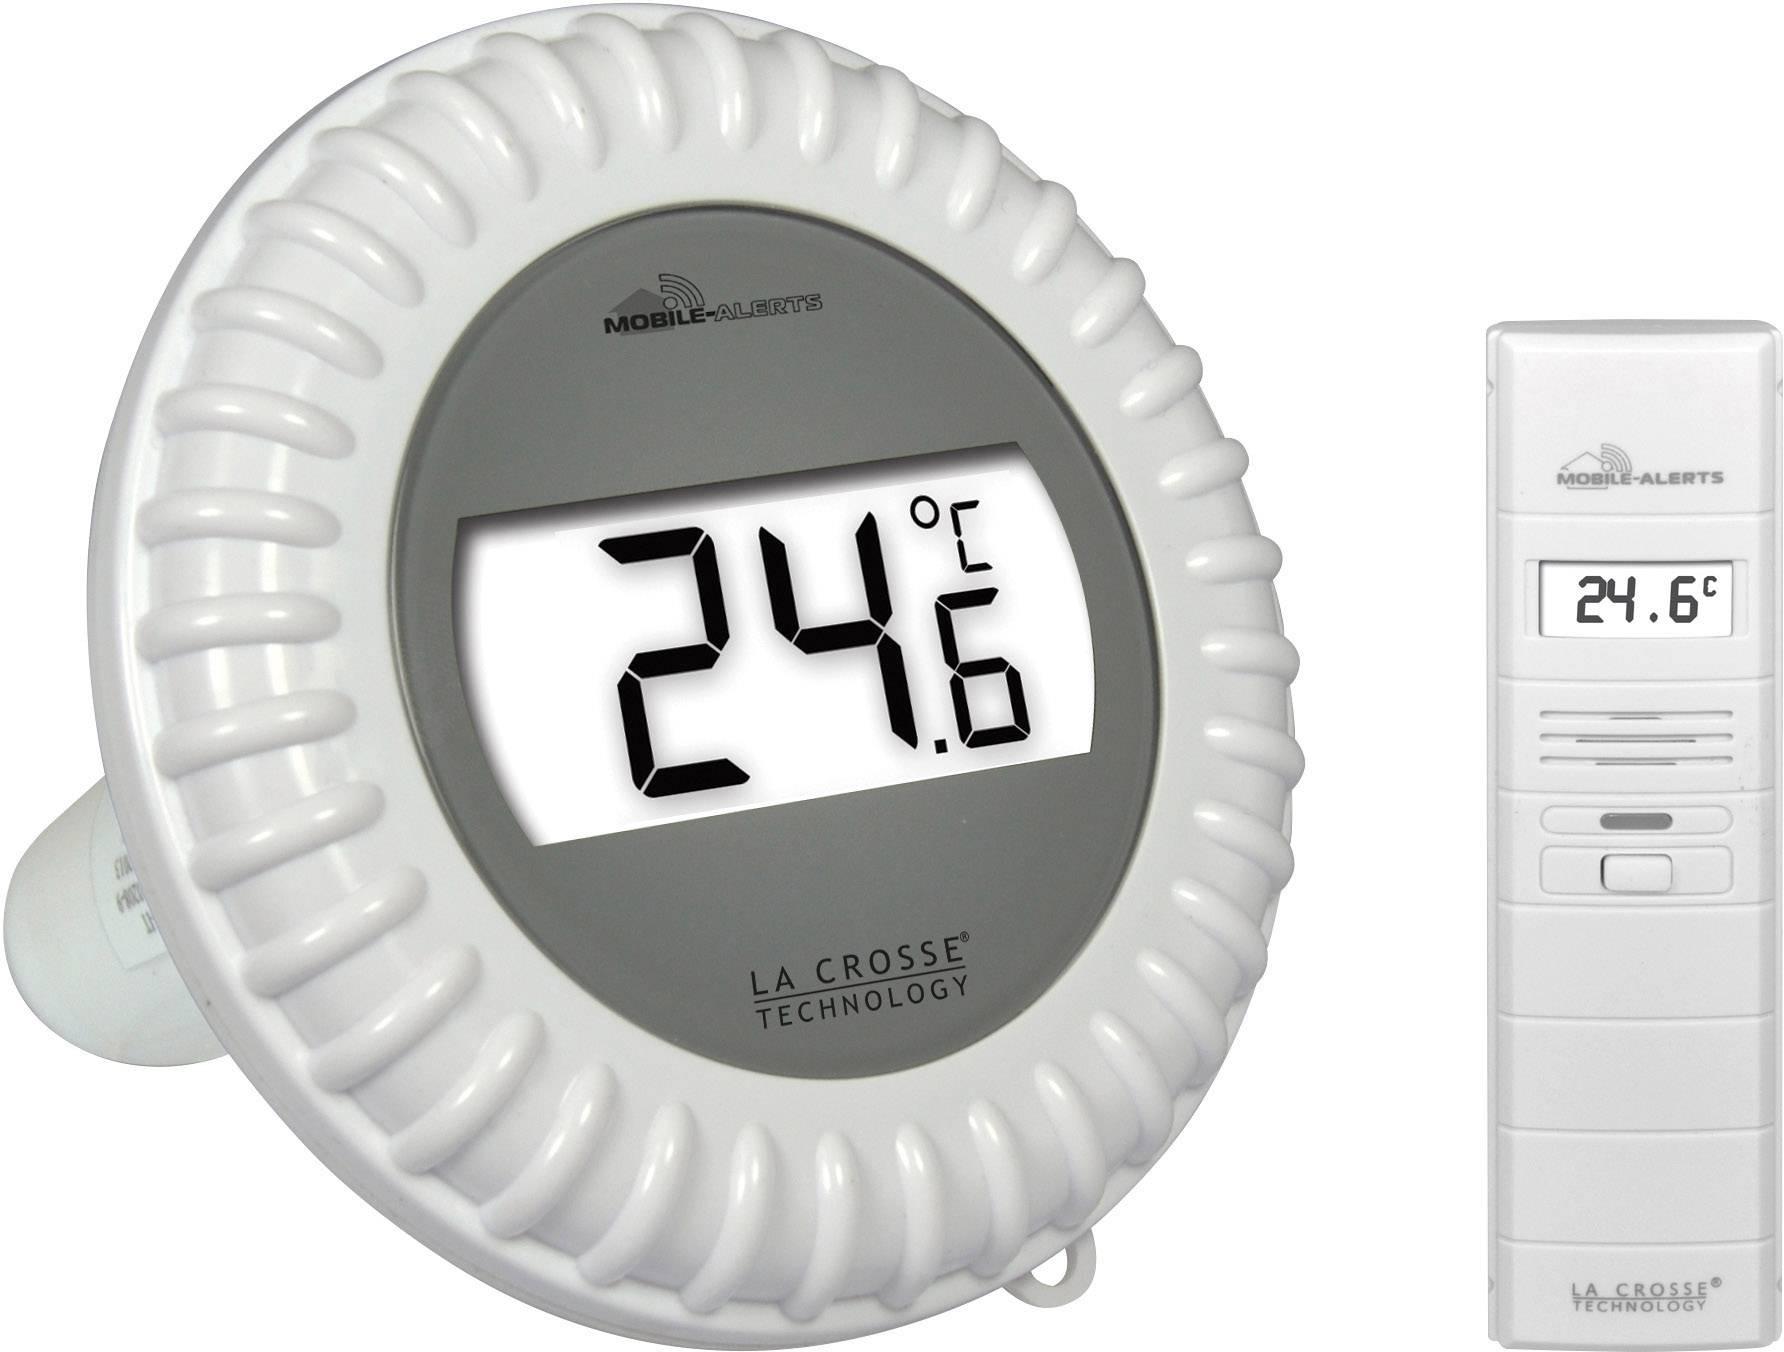 Teplotný / vlhkostný senzor La Crosse Technology MA10700